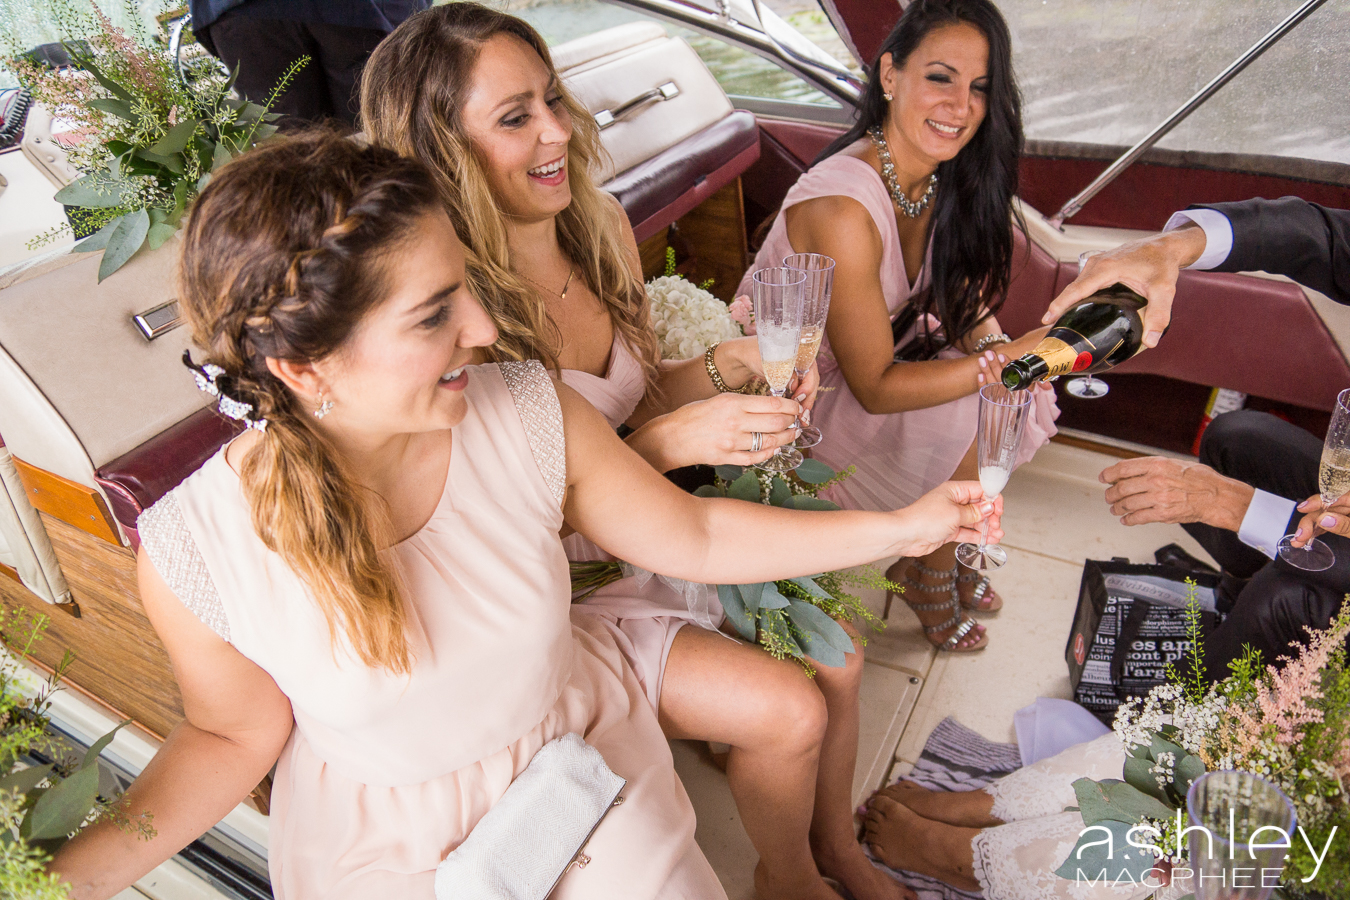 Ashley MacPhee Photography Hudson Yacht Club wedding photographer (36 of 112).jpg